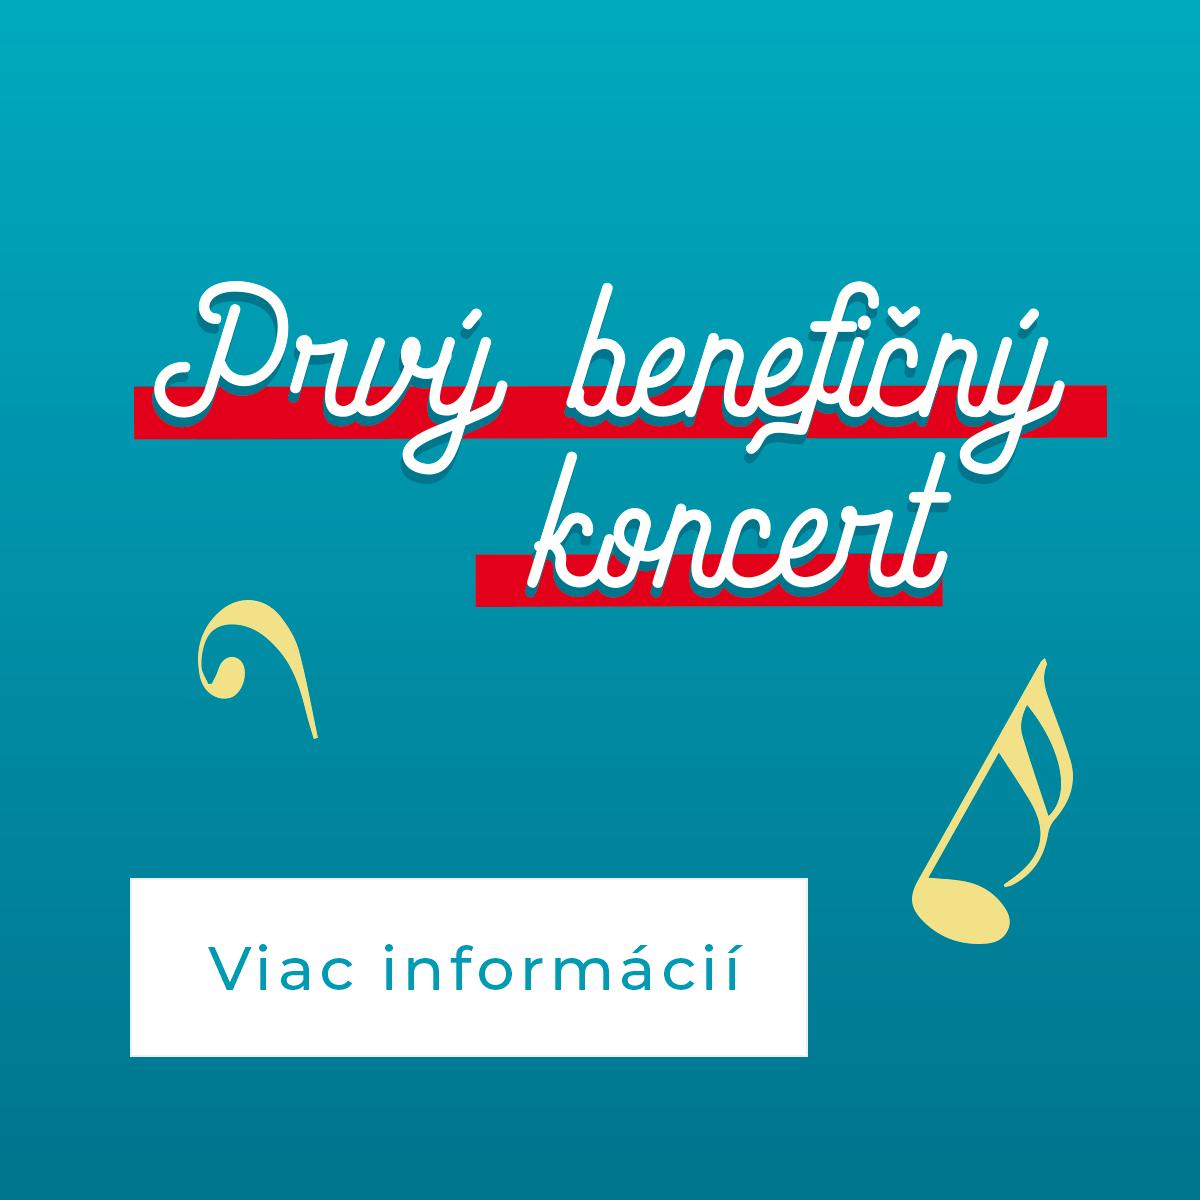 beneficny koncert 2019